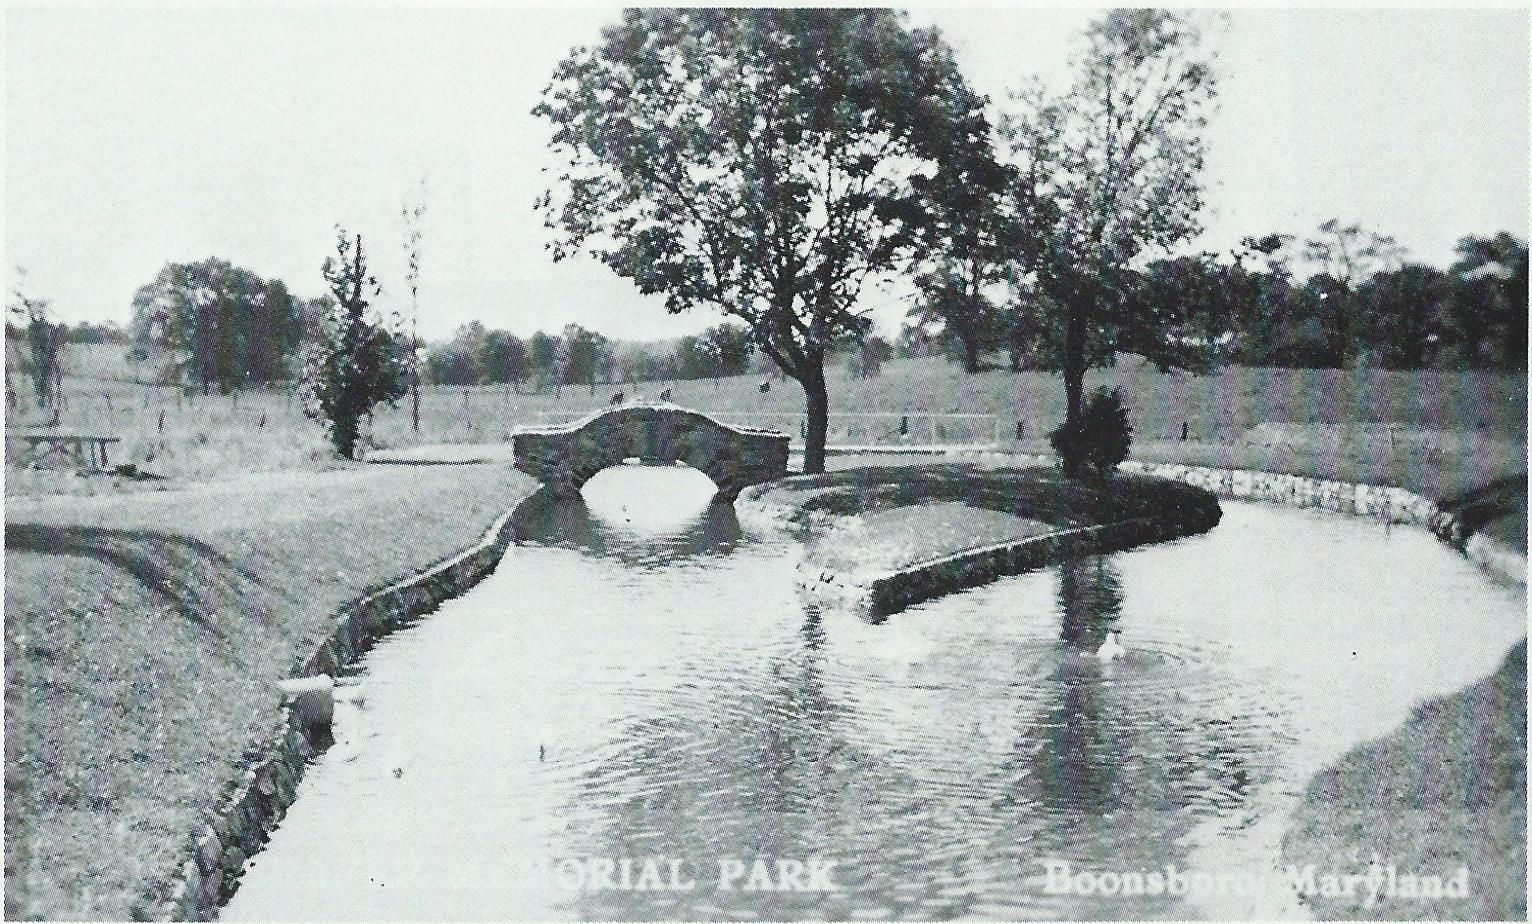 Boonsboro Reflections: Shafer Park